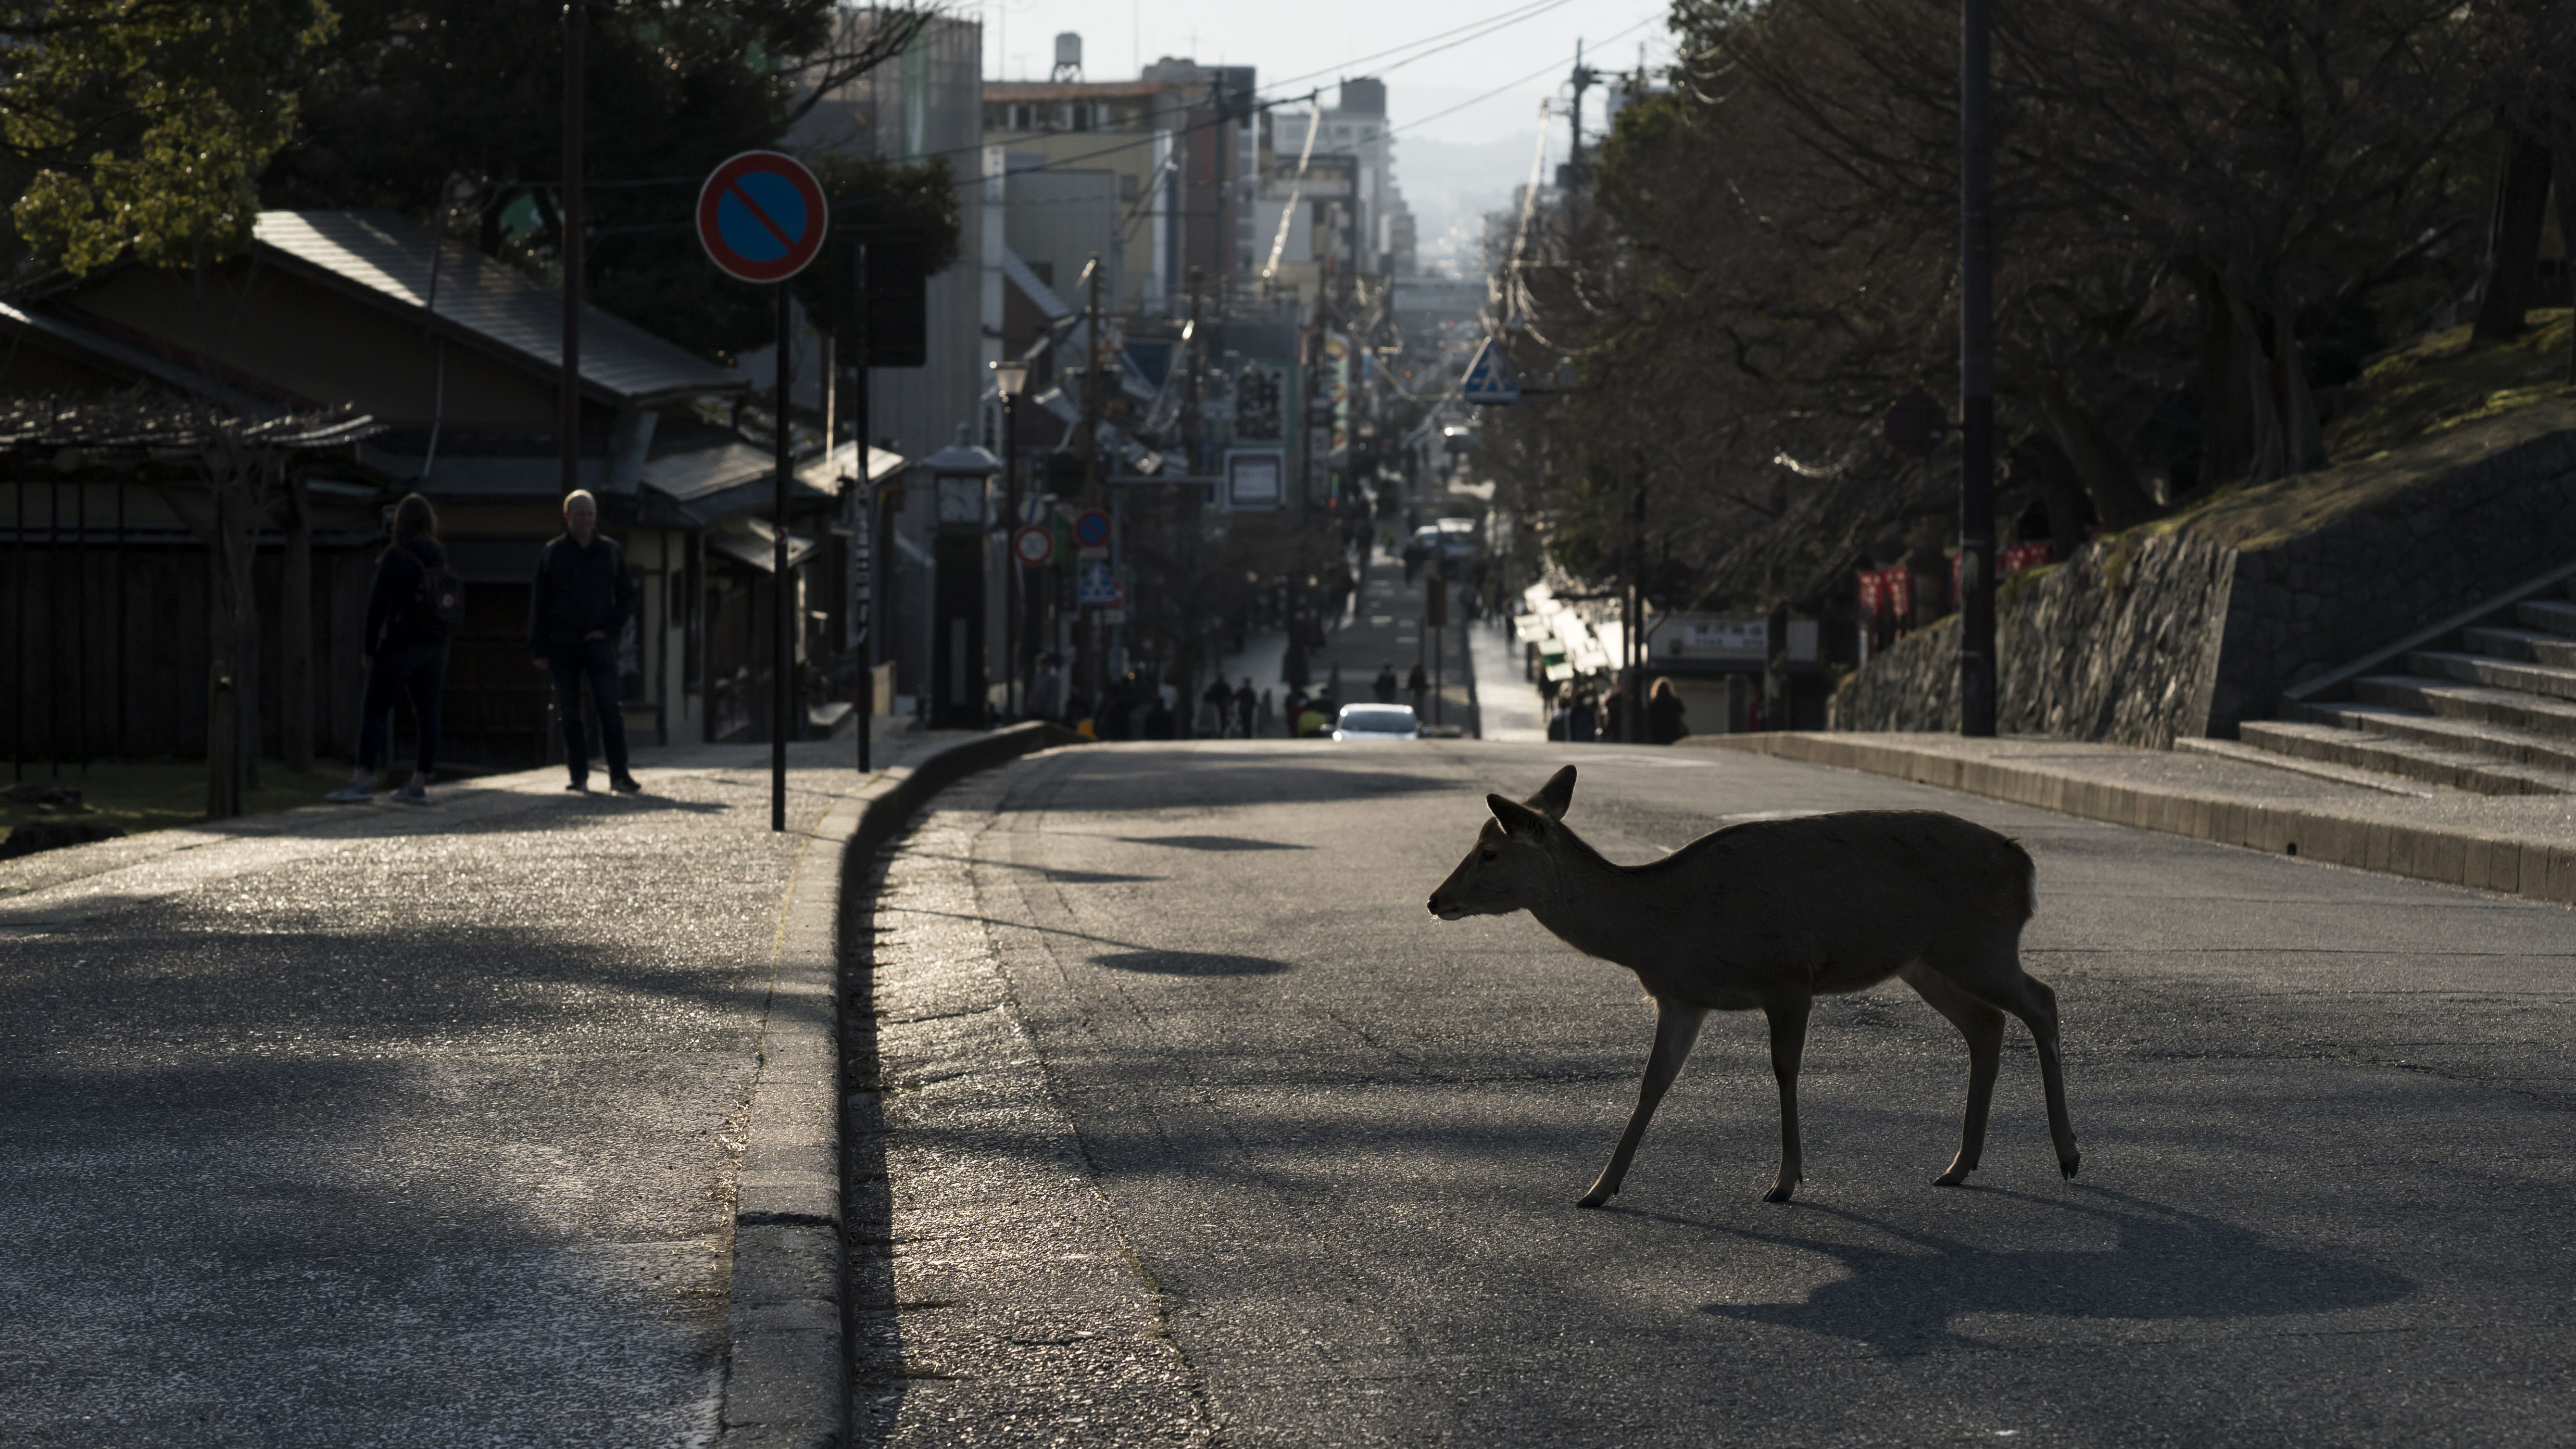 With Humans in Lockdown, Animals Flourish